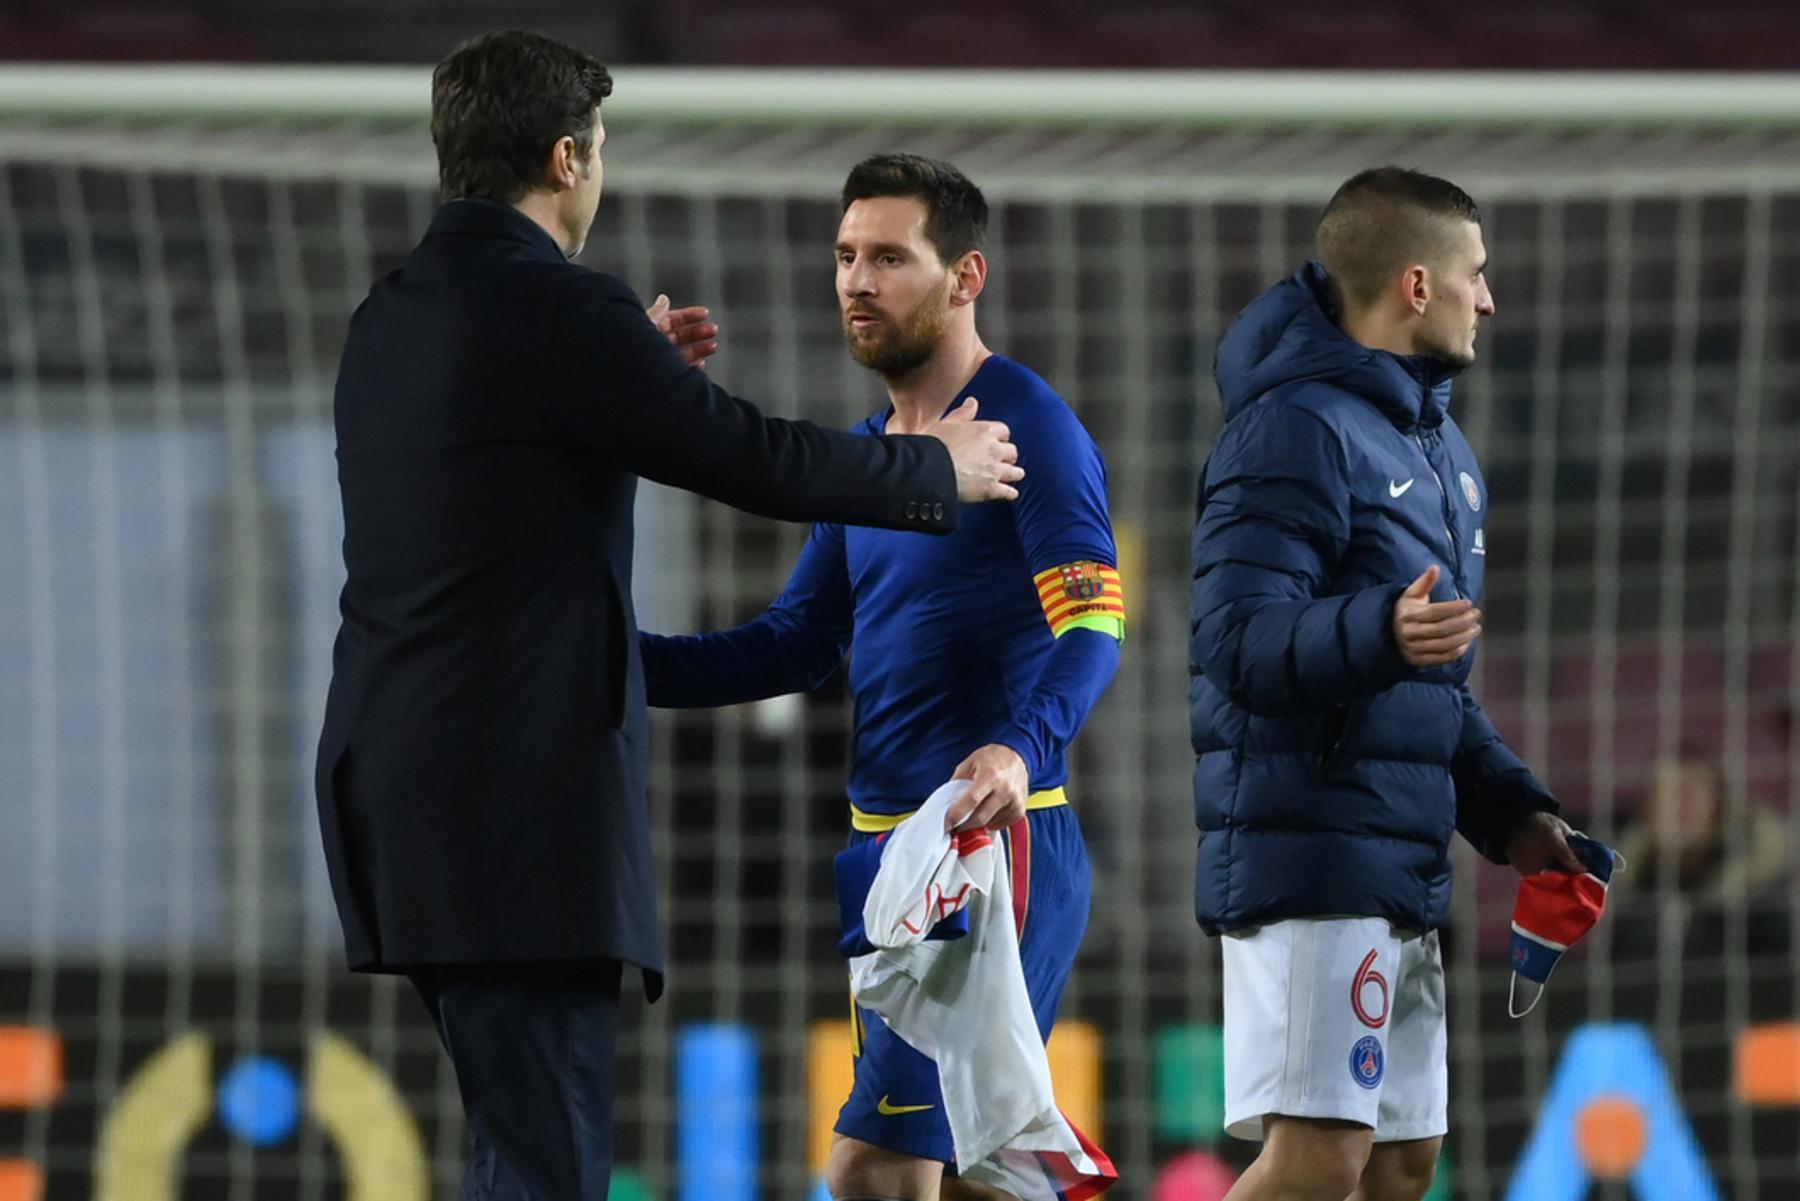 Mercato : Pochettino révèle sa conversation avec Messi sur sa prolongation au Barça